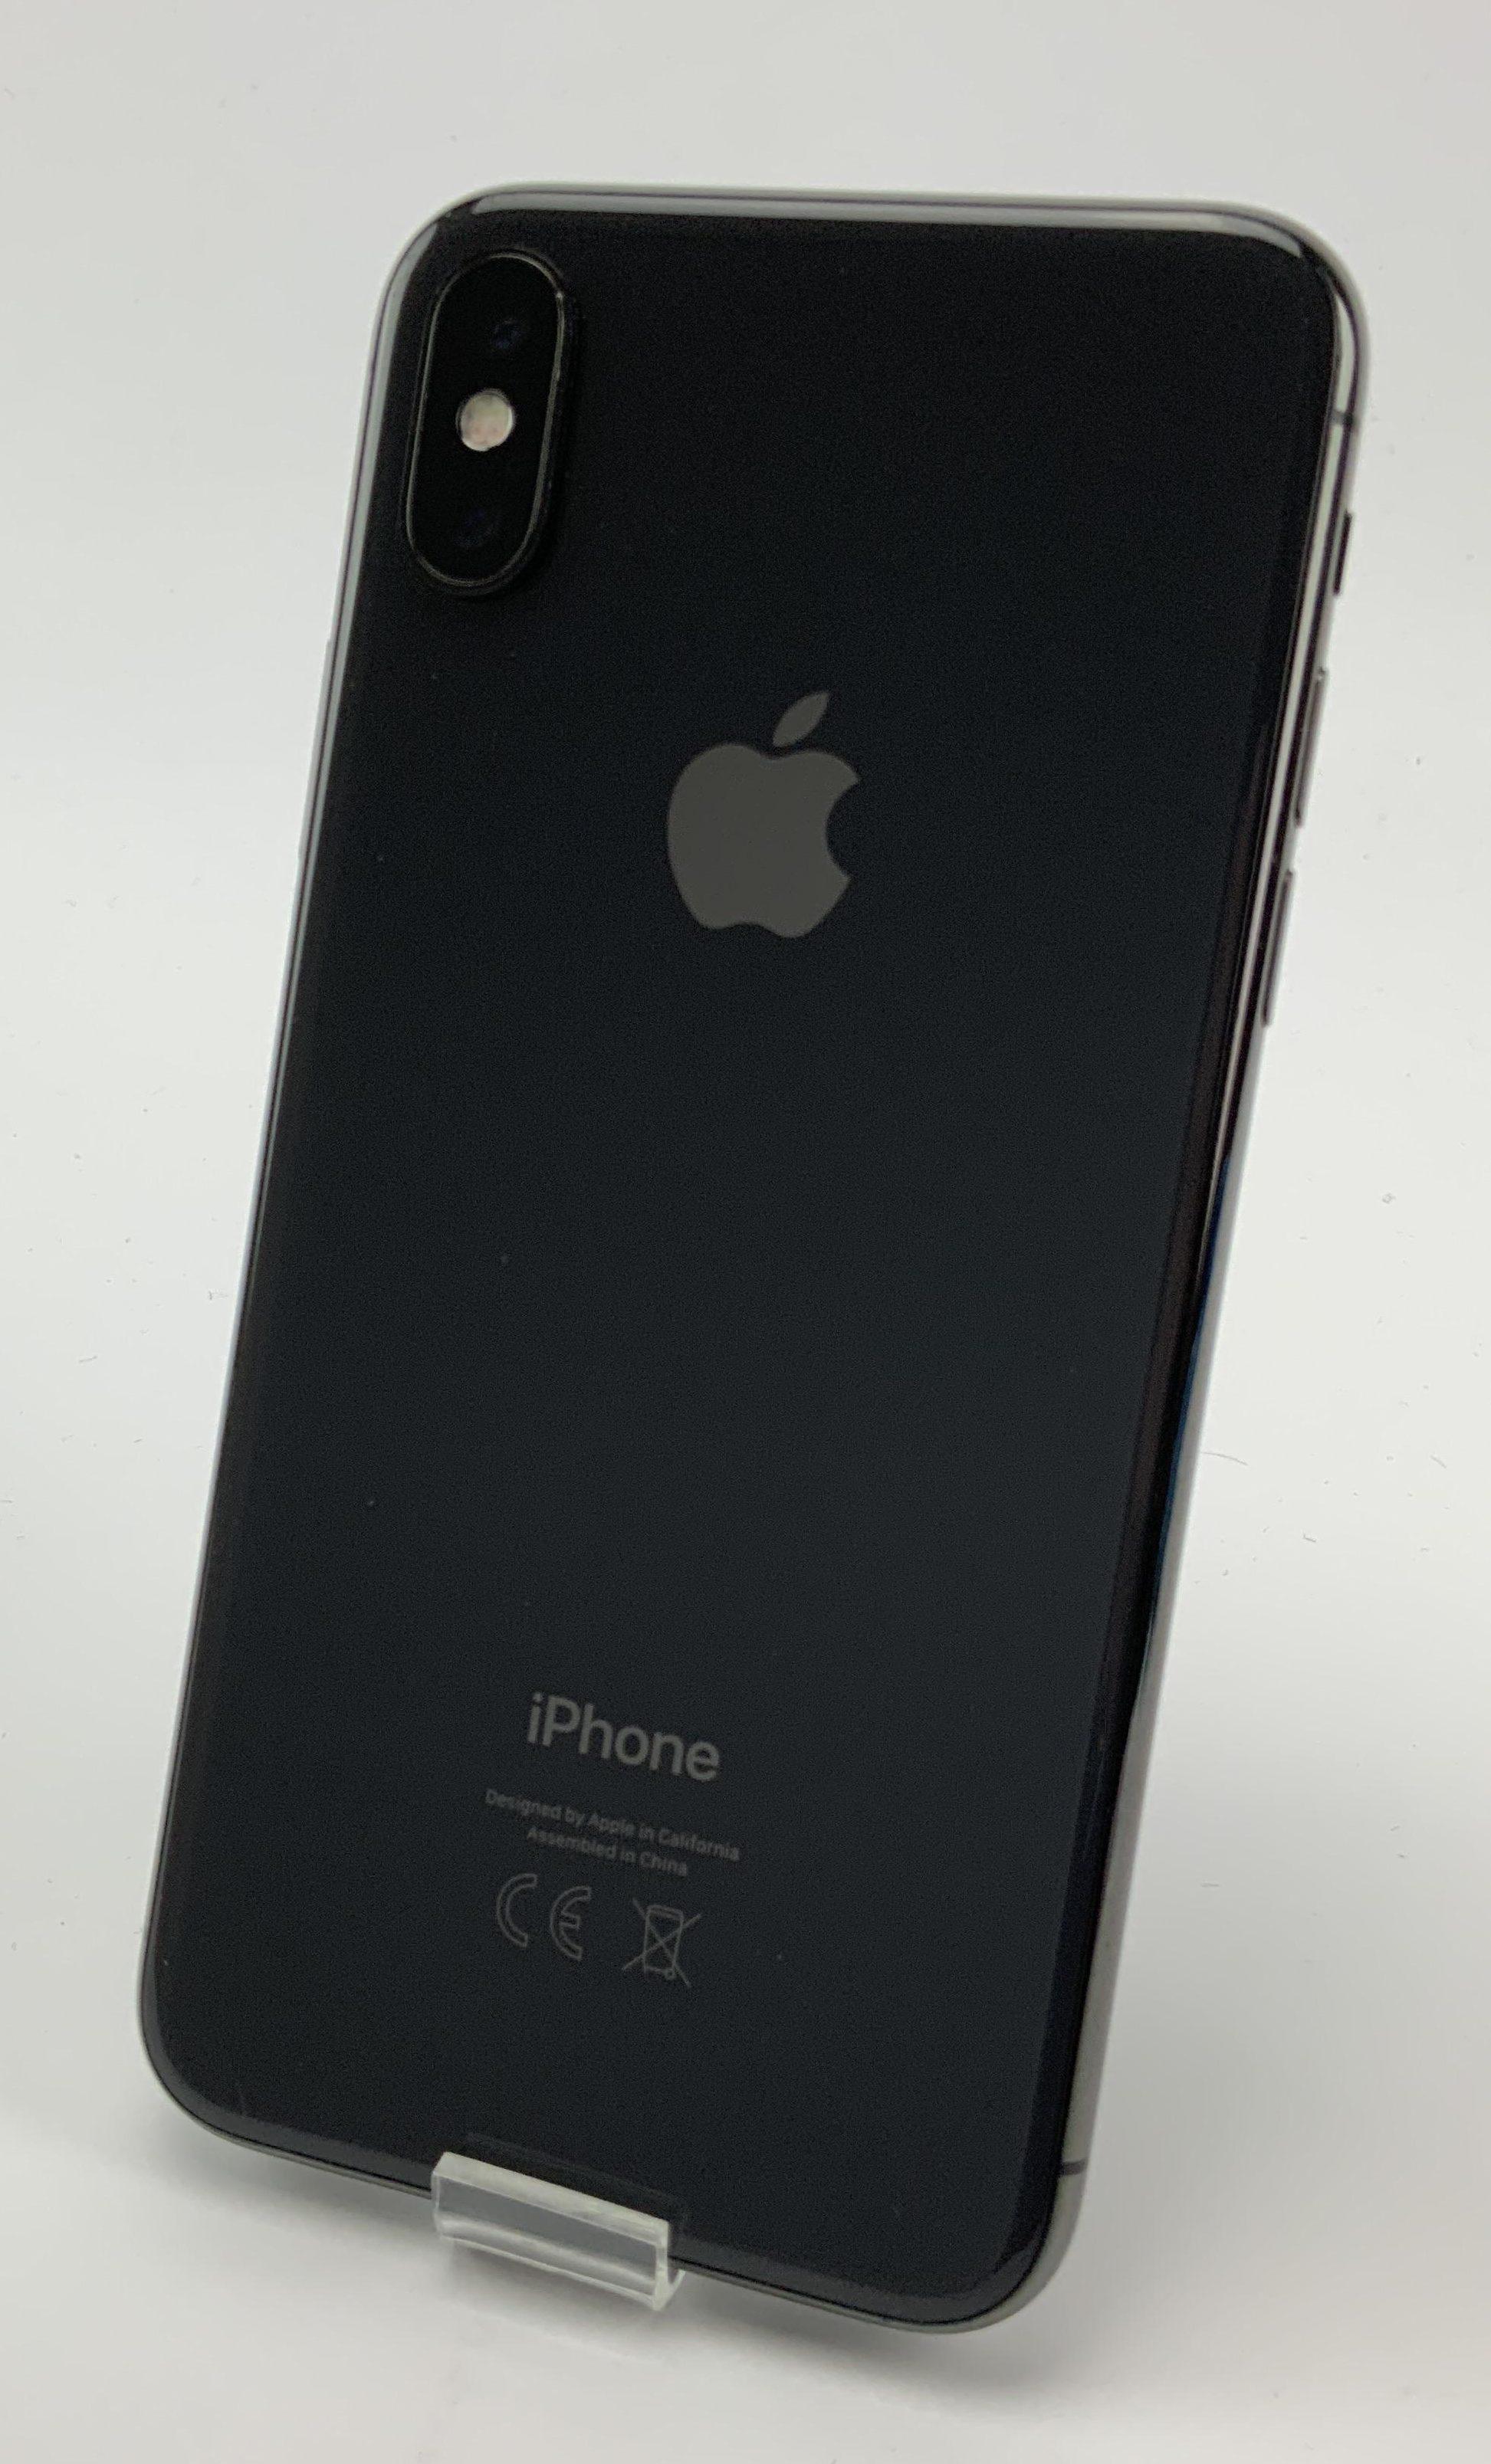 iPhone X 256GB, 256GB, Space Gray, obraz 2